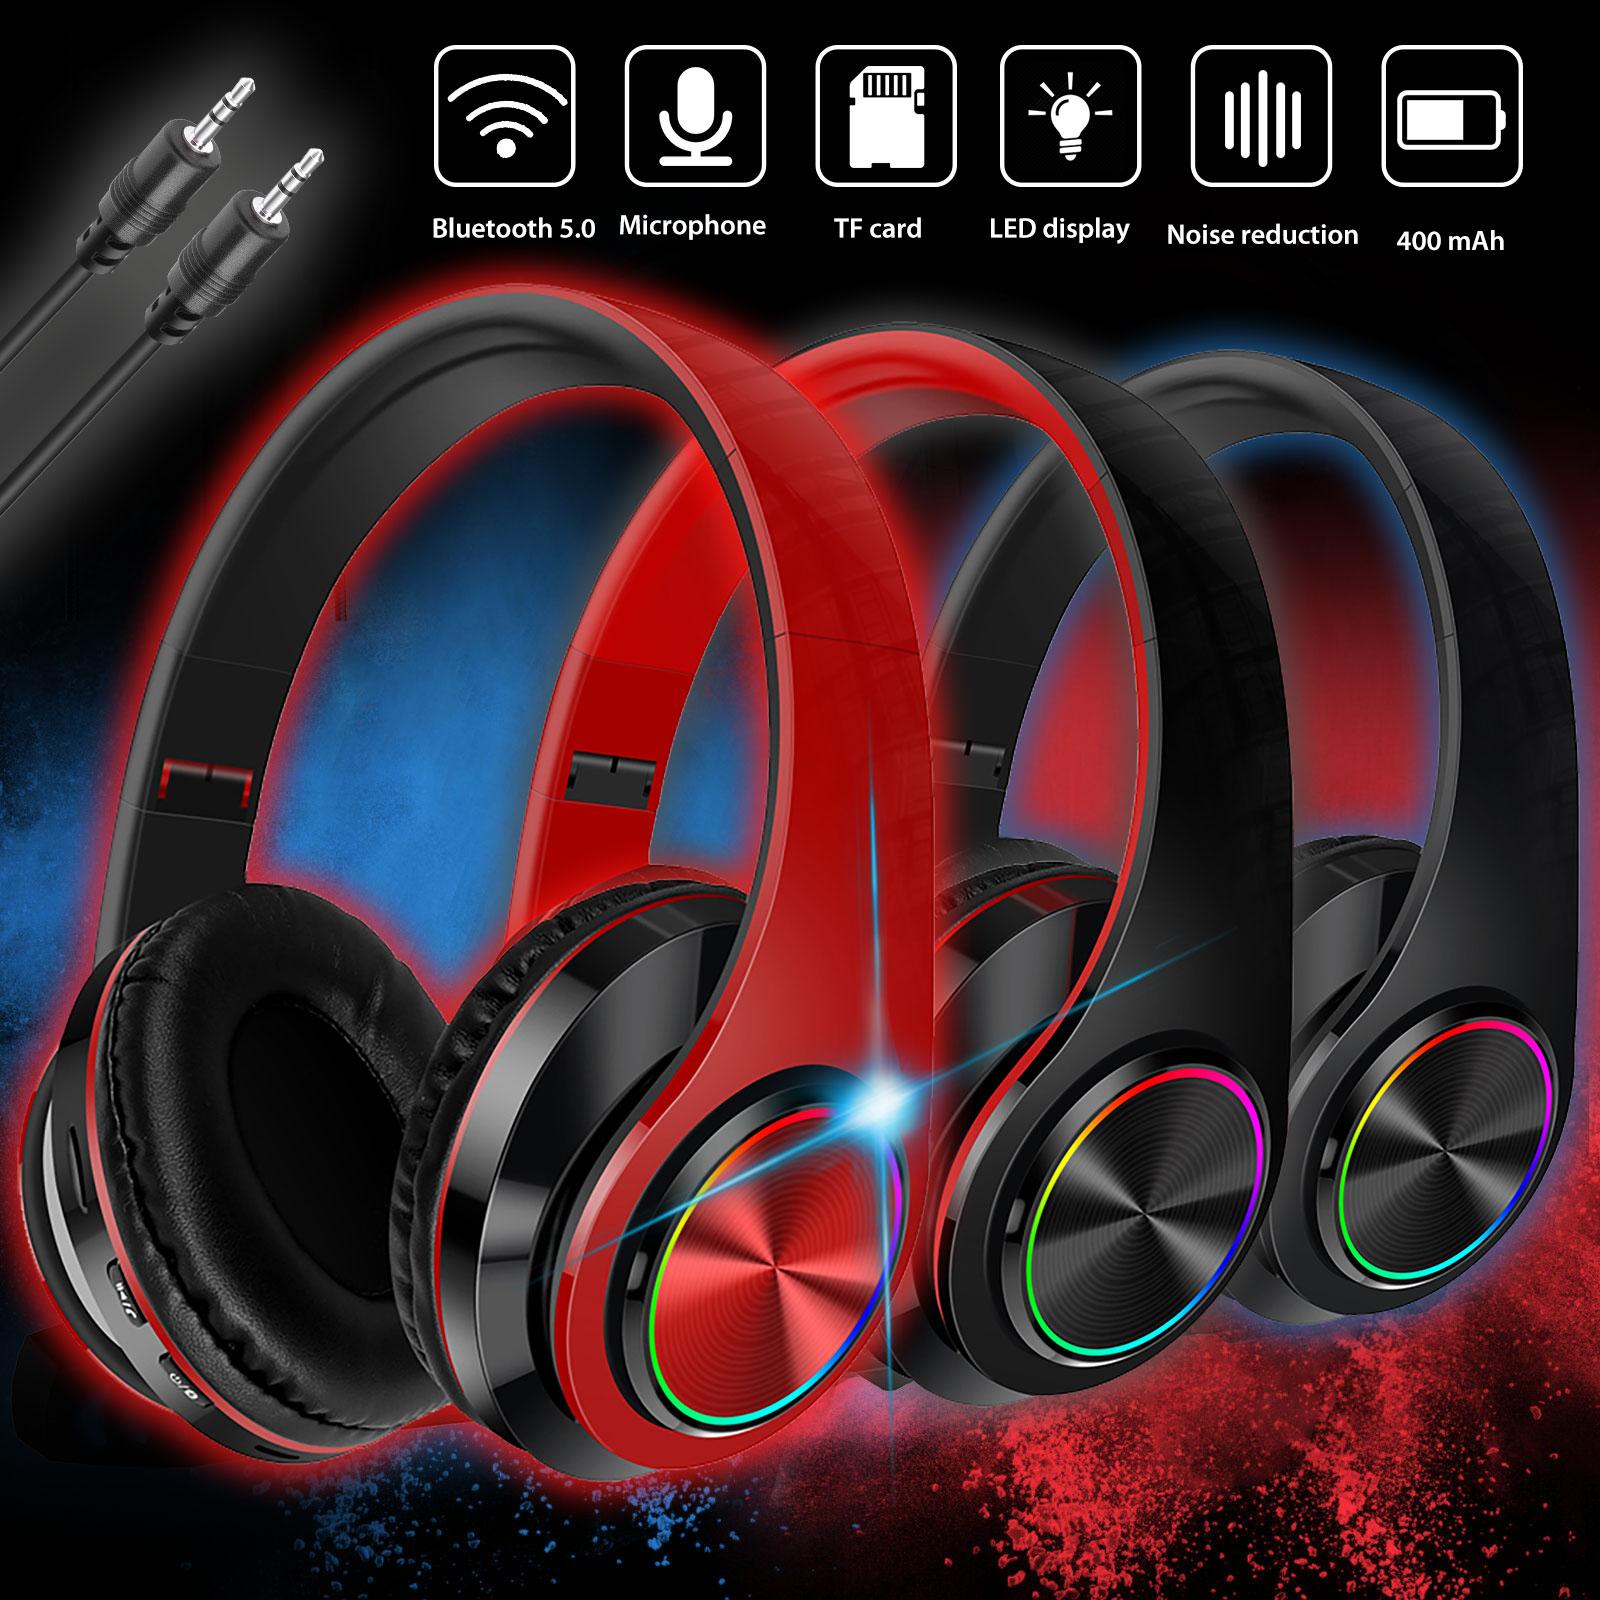 Wireless Noise Cancelling Headphone HIFI Bluetooth Earphone